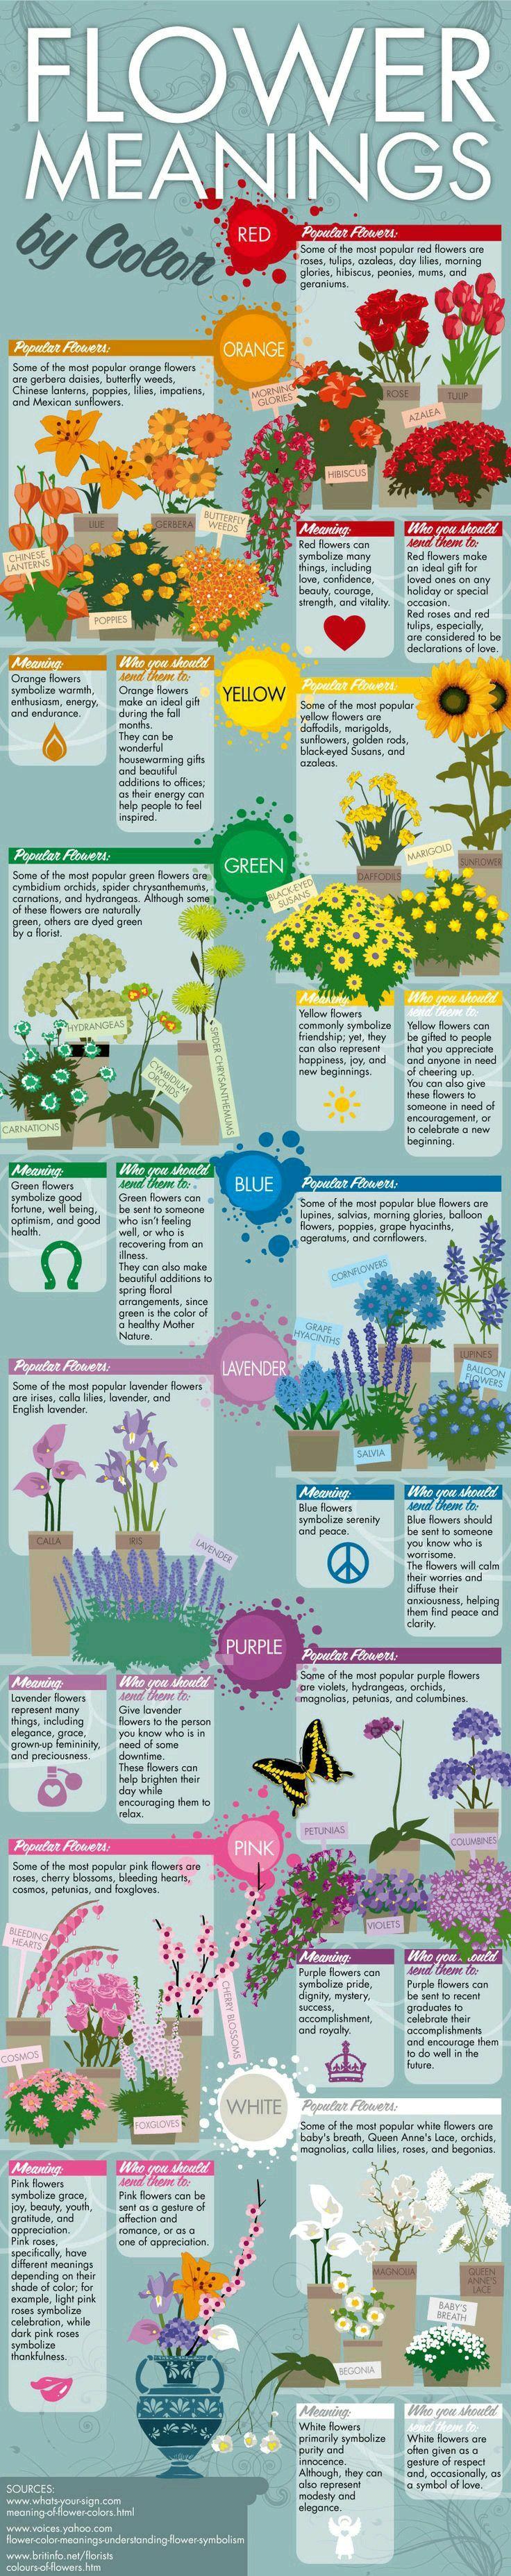 25 best Birth Language images on Pinterest | Language of flowers ...